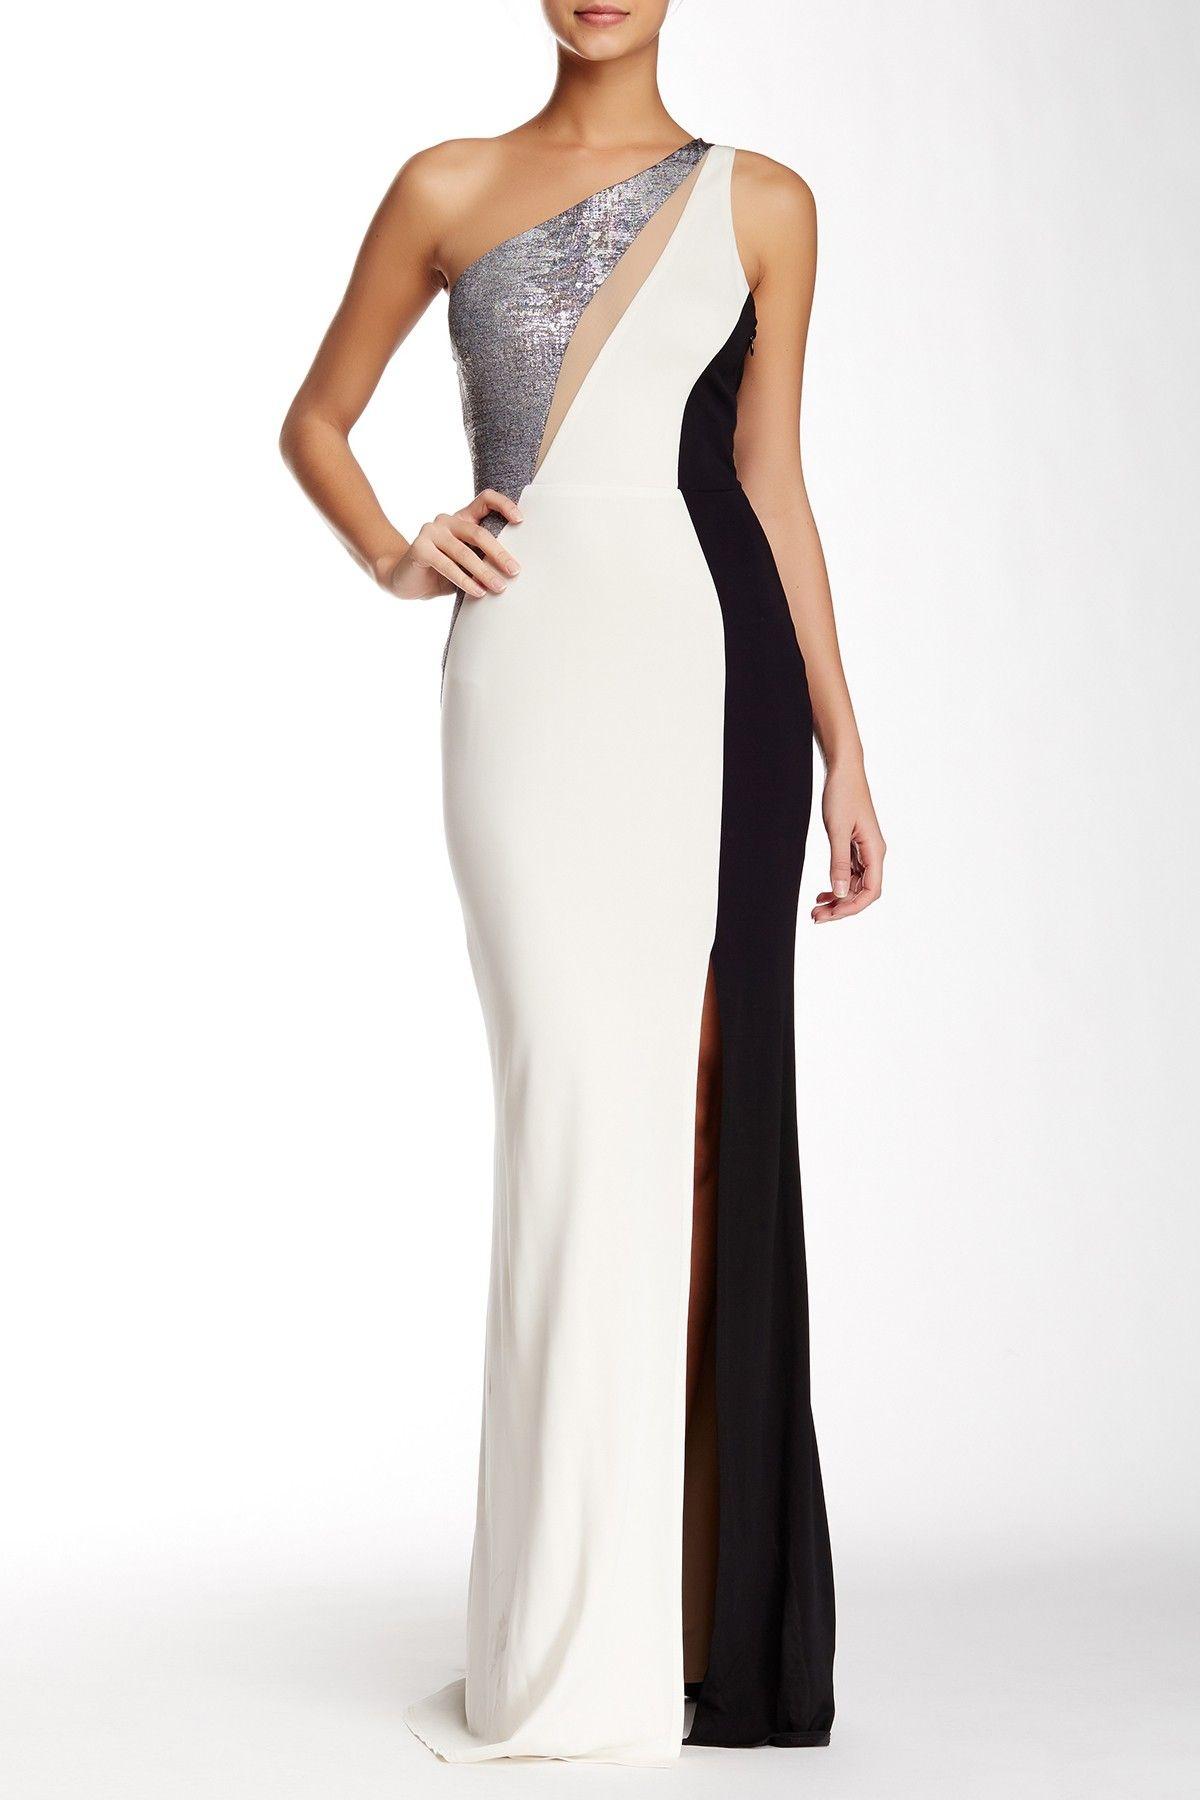 3acd5ef790a4 Nordstrom Rack Womens Evening Dresses